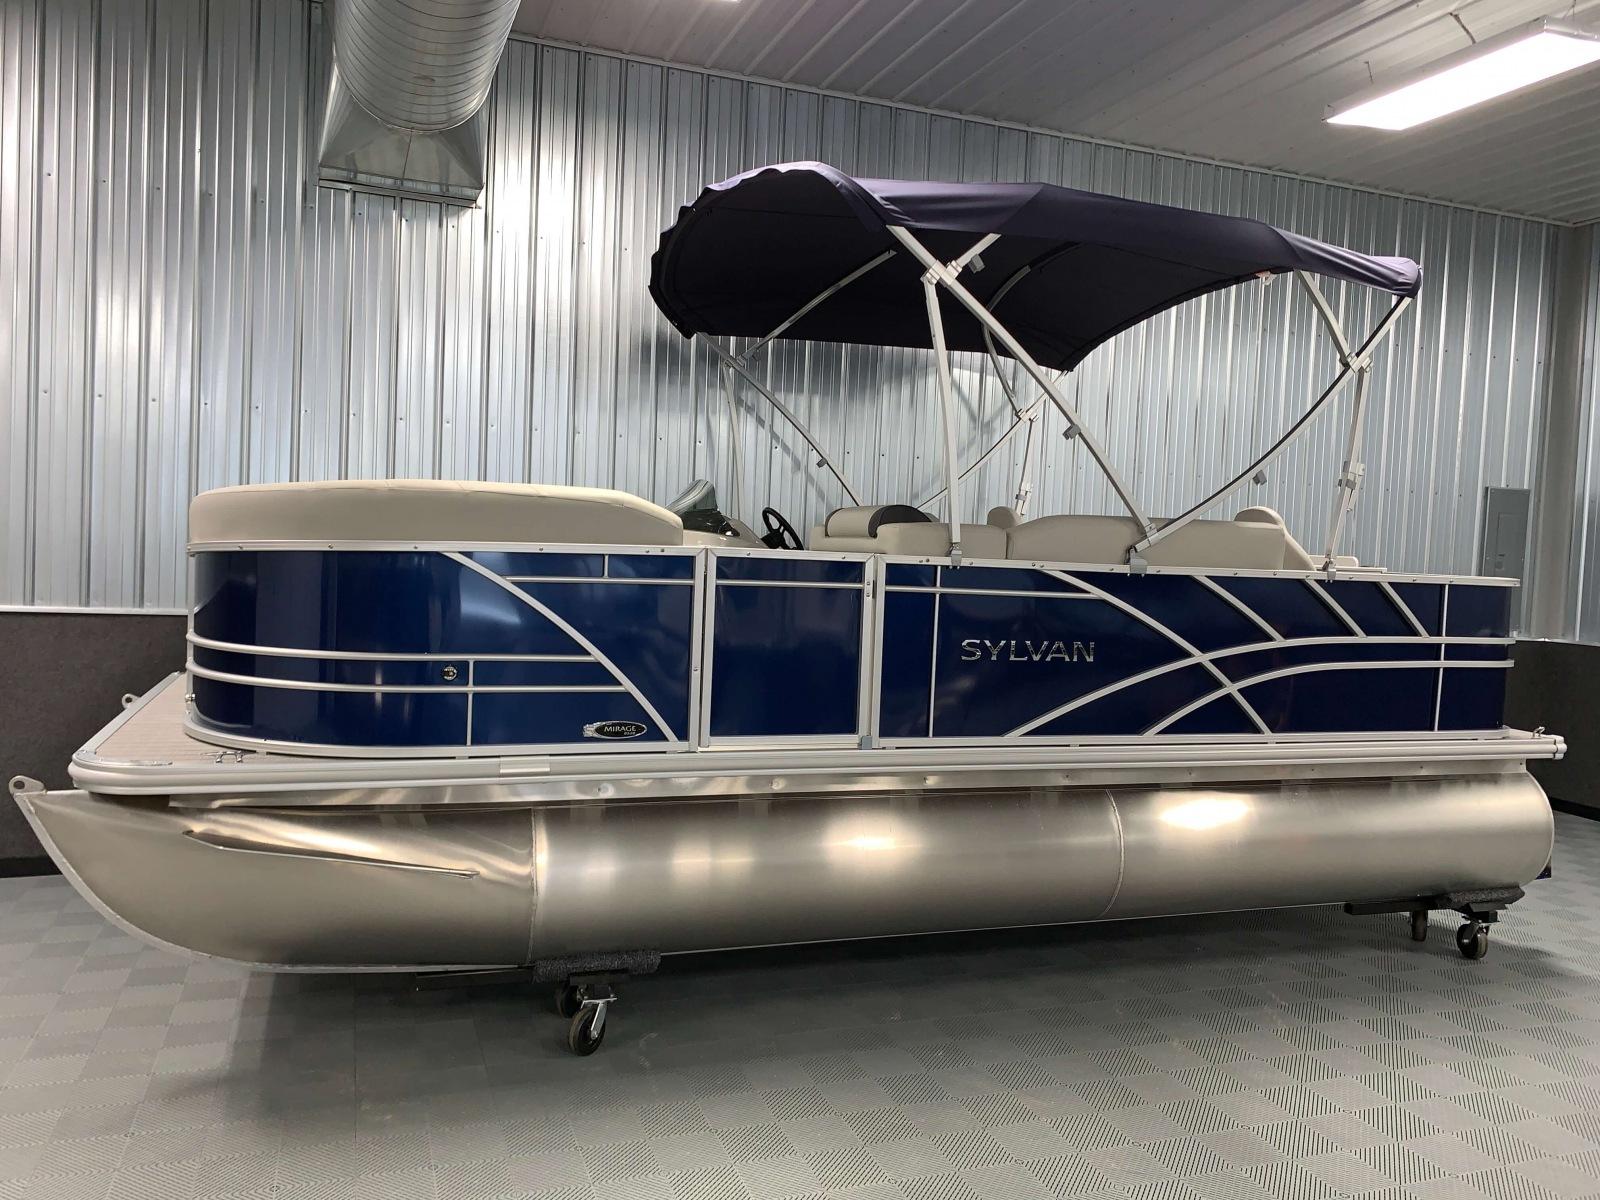 D-Rail Panels of a 2021 Sylvan 8520 Party Fish Pontoon Boat